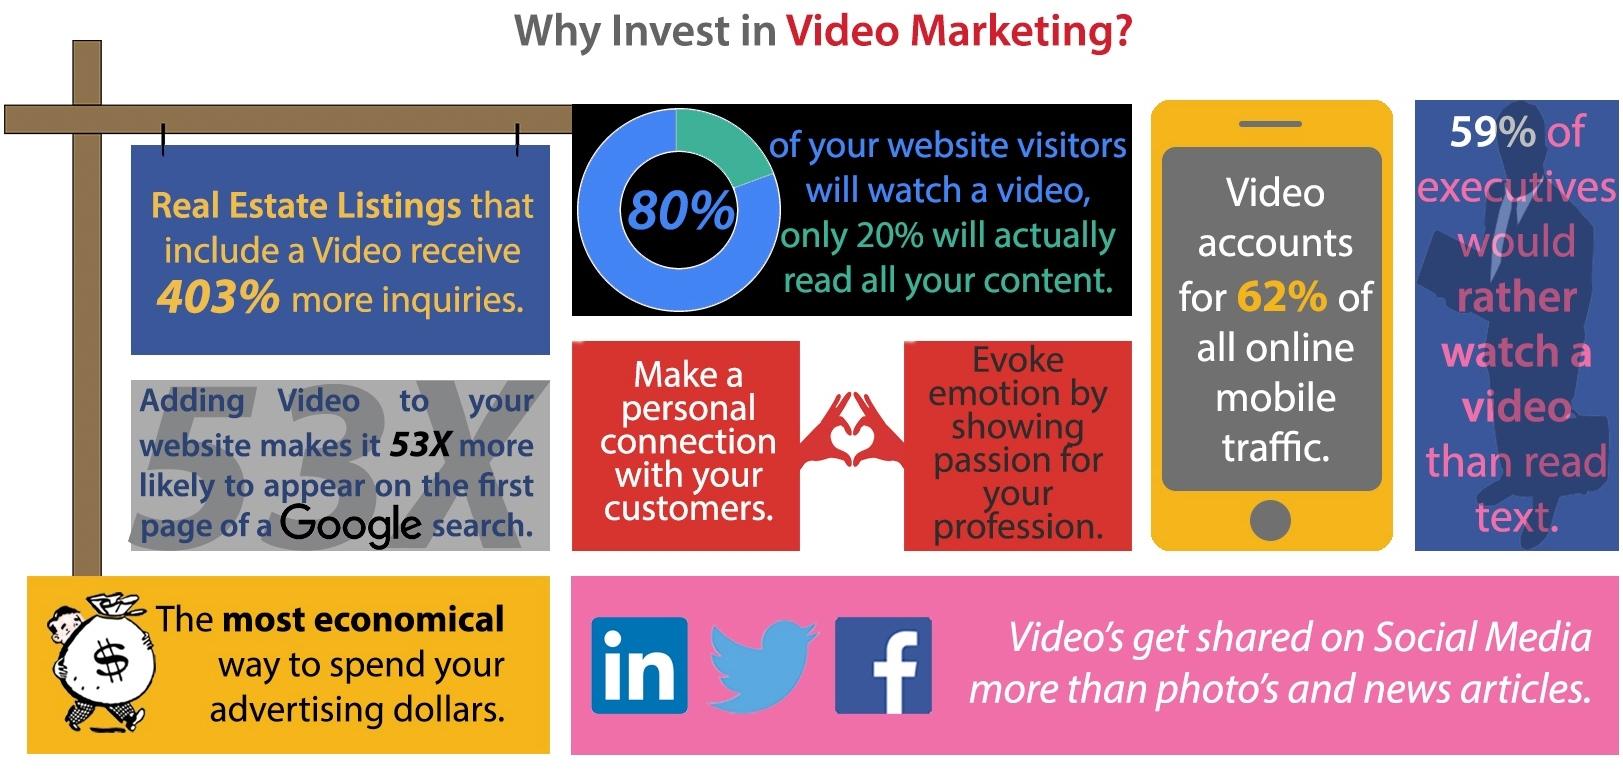 Why Video Page Crop 2.jpg